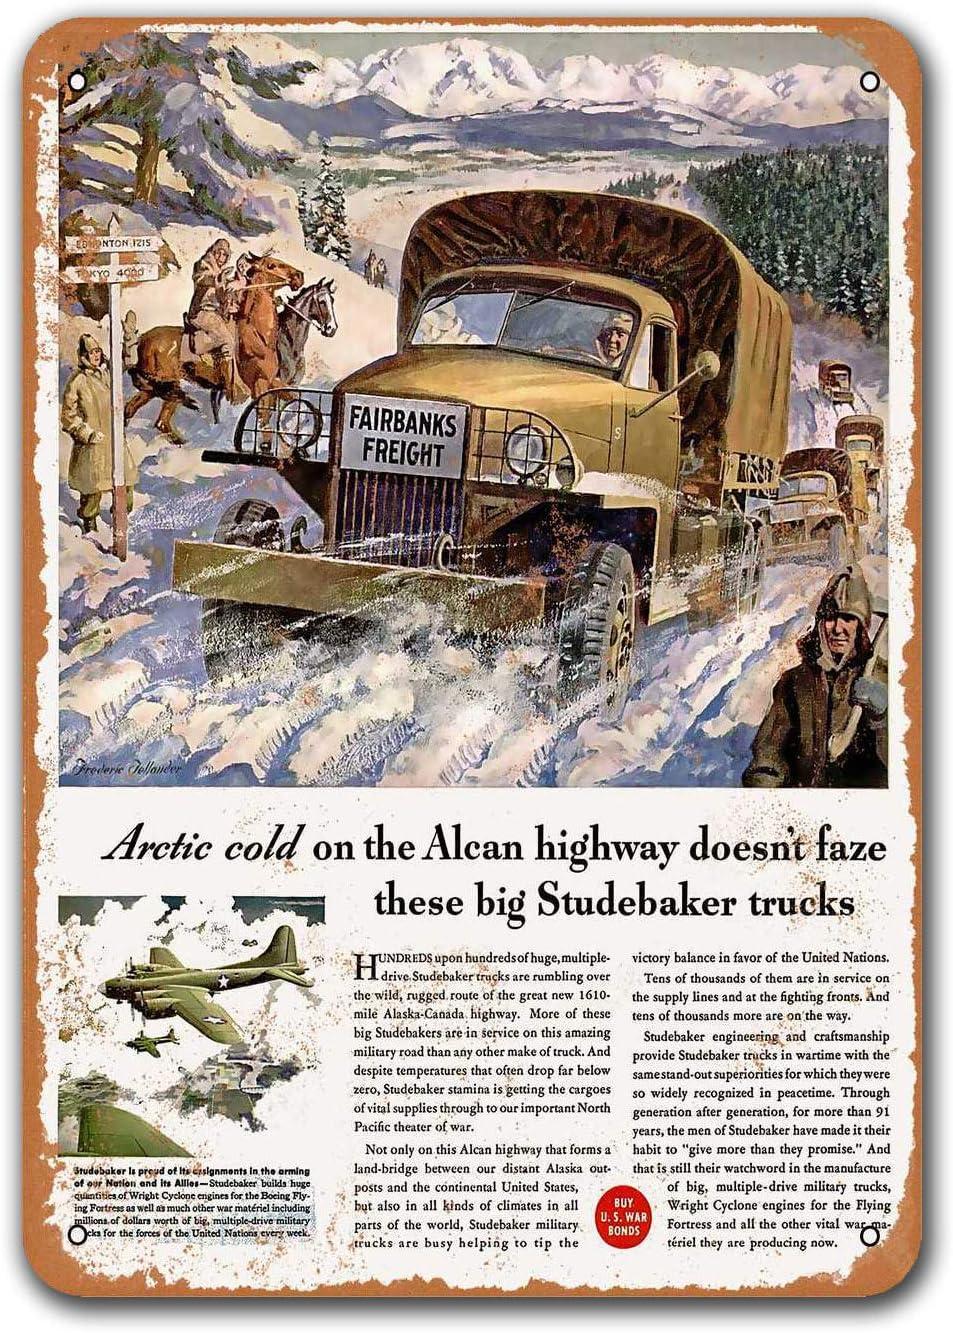 Sisoso Wall Decor Coffee Club Game Room 1943 Studebaker Trucks Alaska-Canada HWY Old Car Tin Sign Vintage Metal Bar Poster Bar Pub Restaurant 8x12 inches